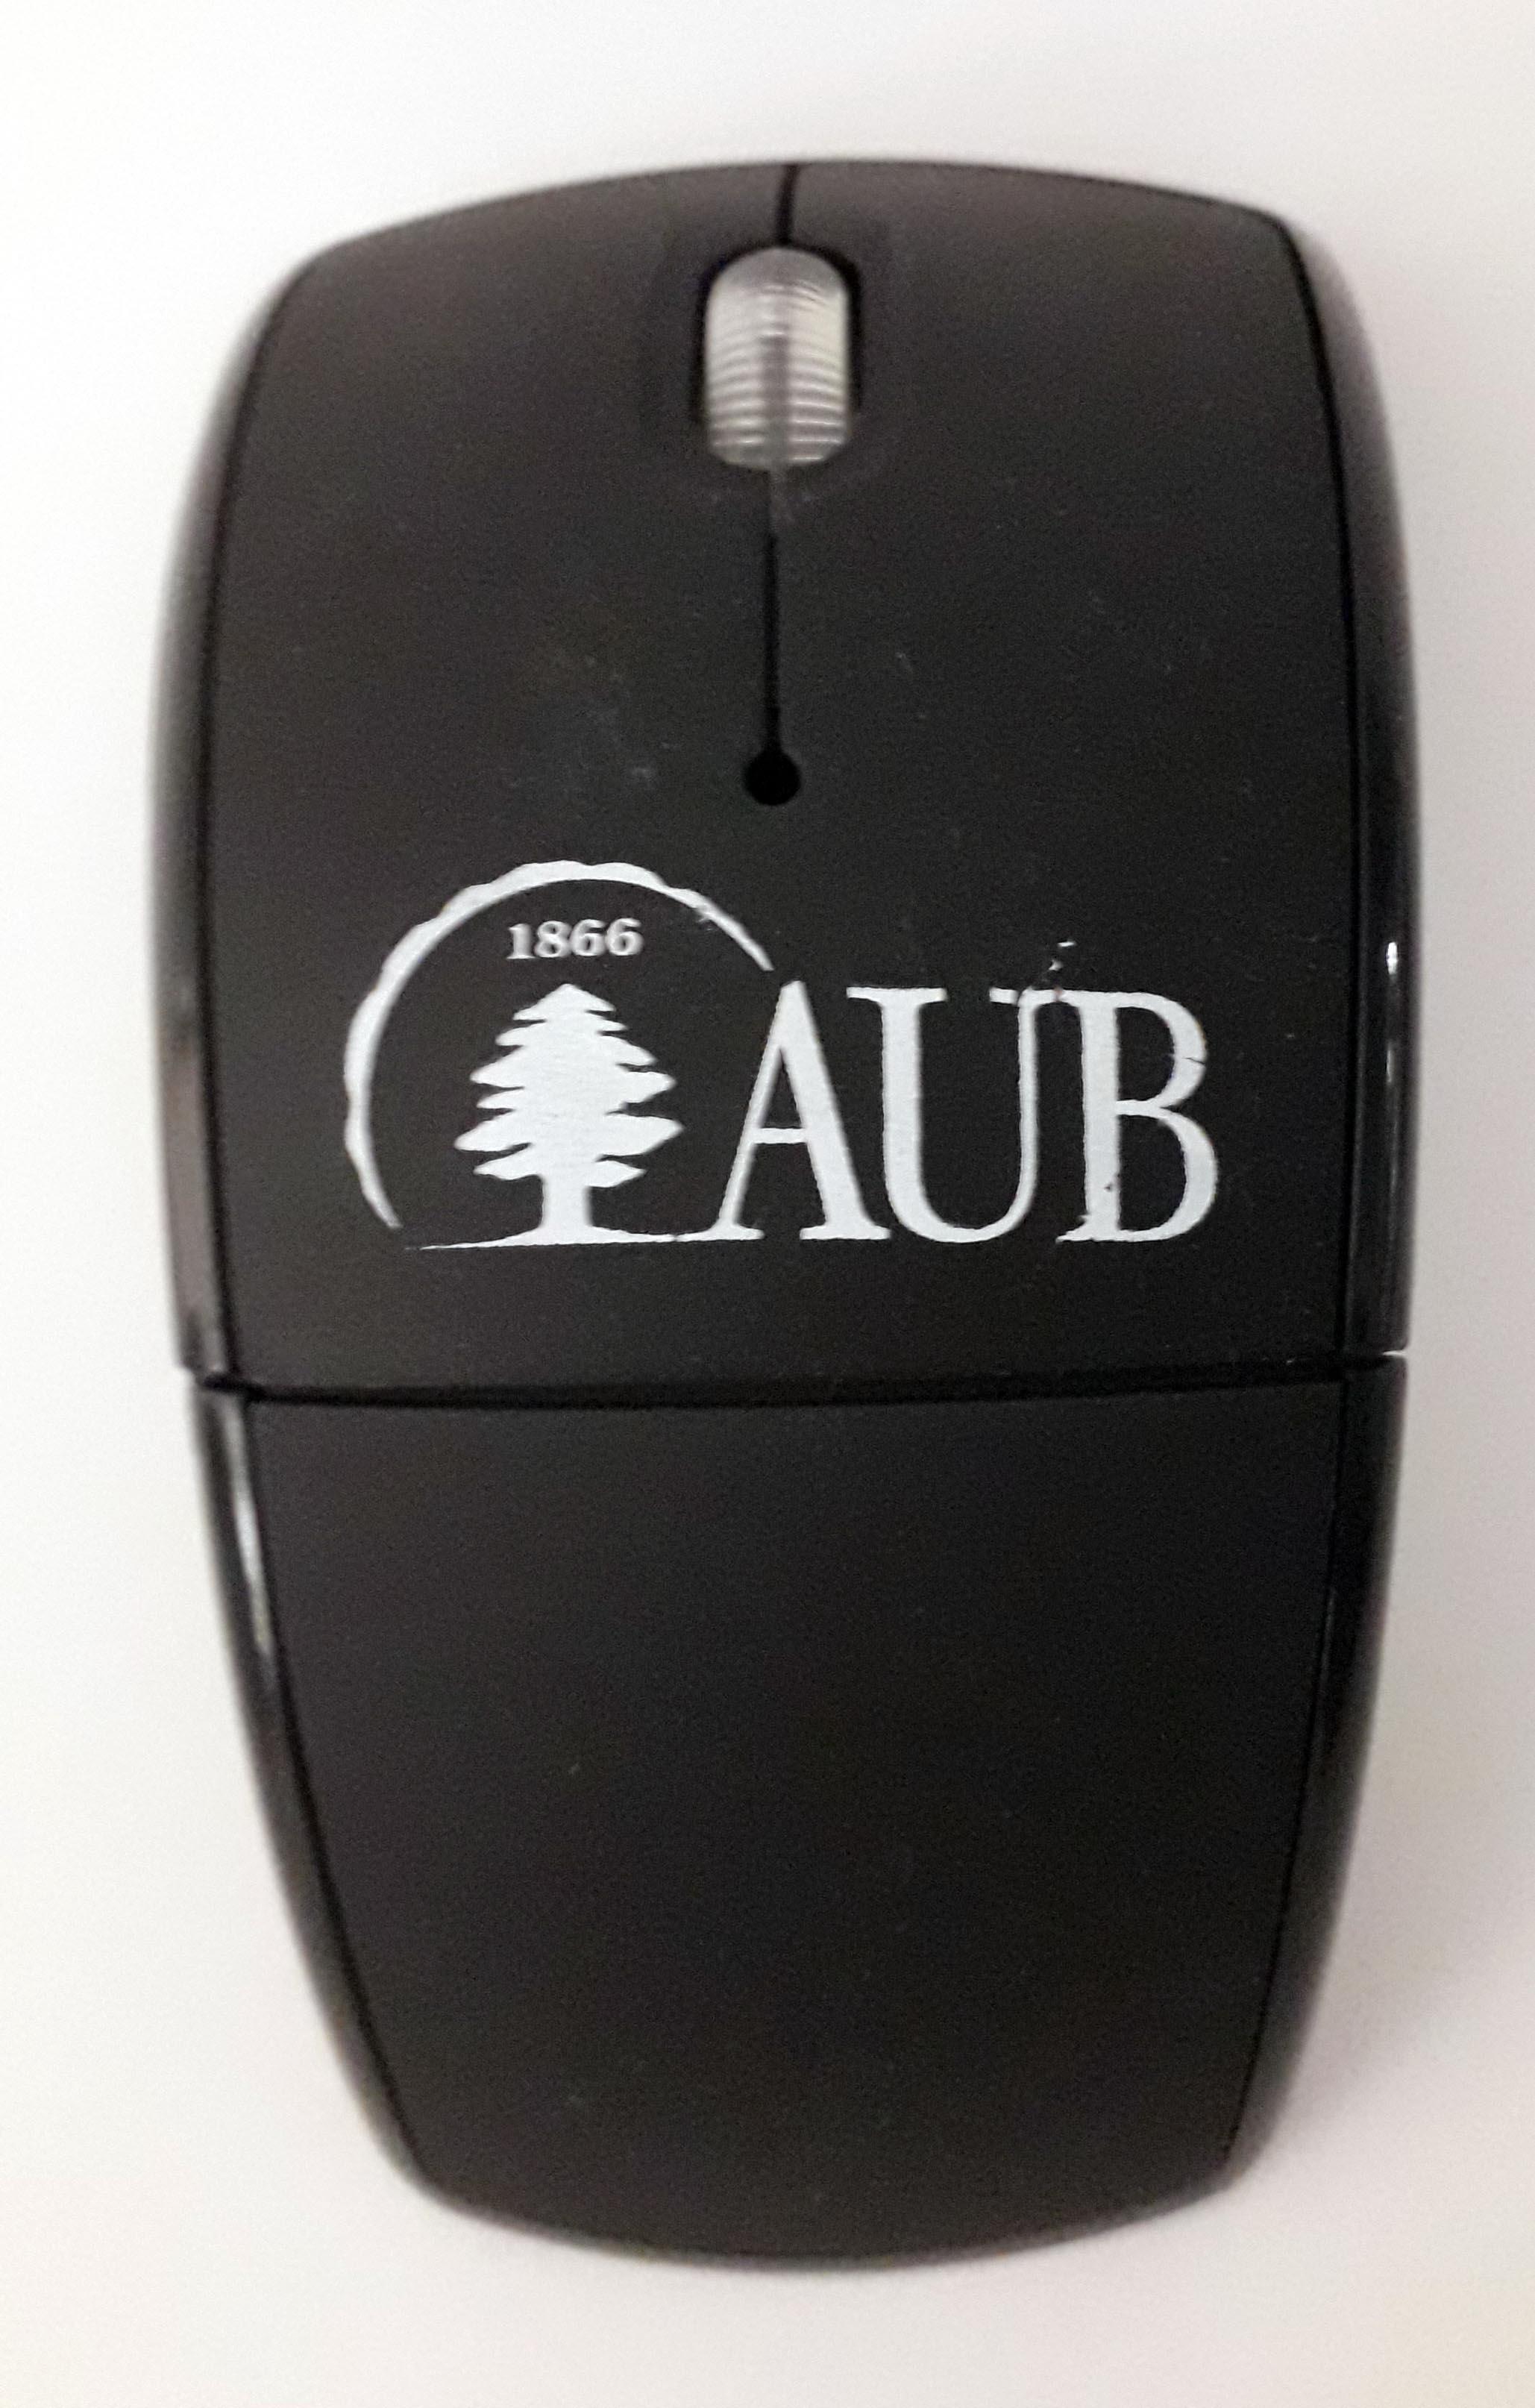 AUB FOLDABLE WIRELESS MOUSE 2.4G BLACK